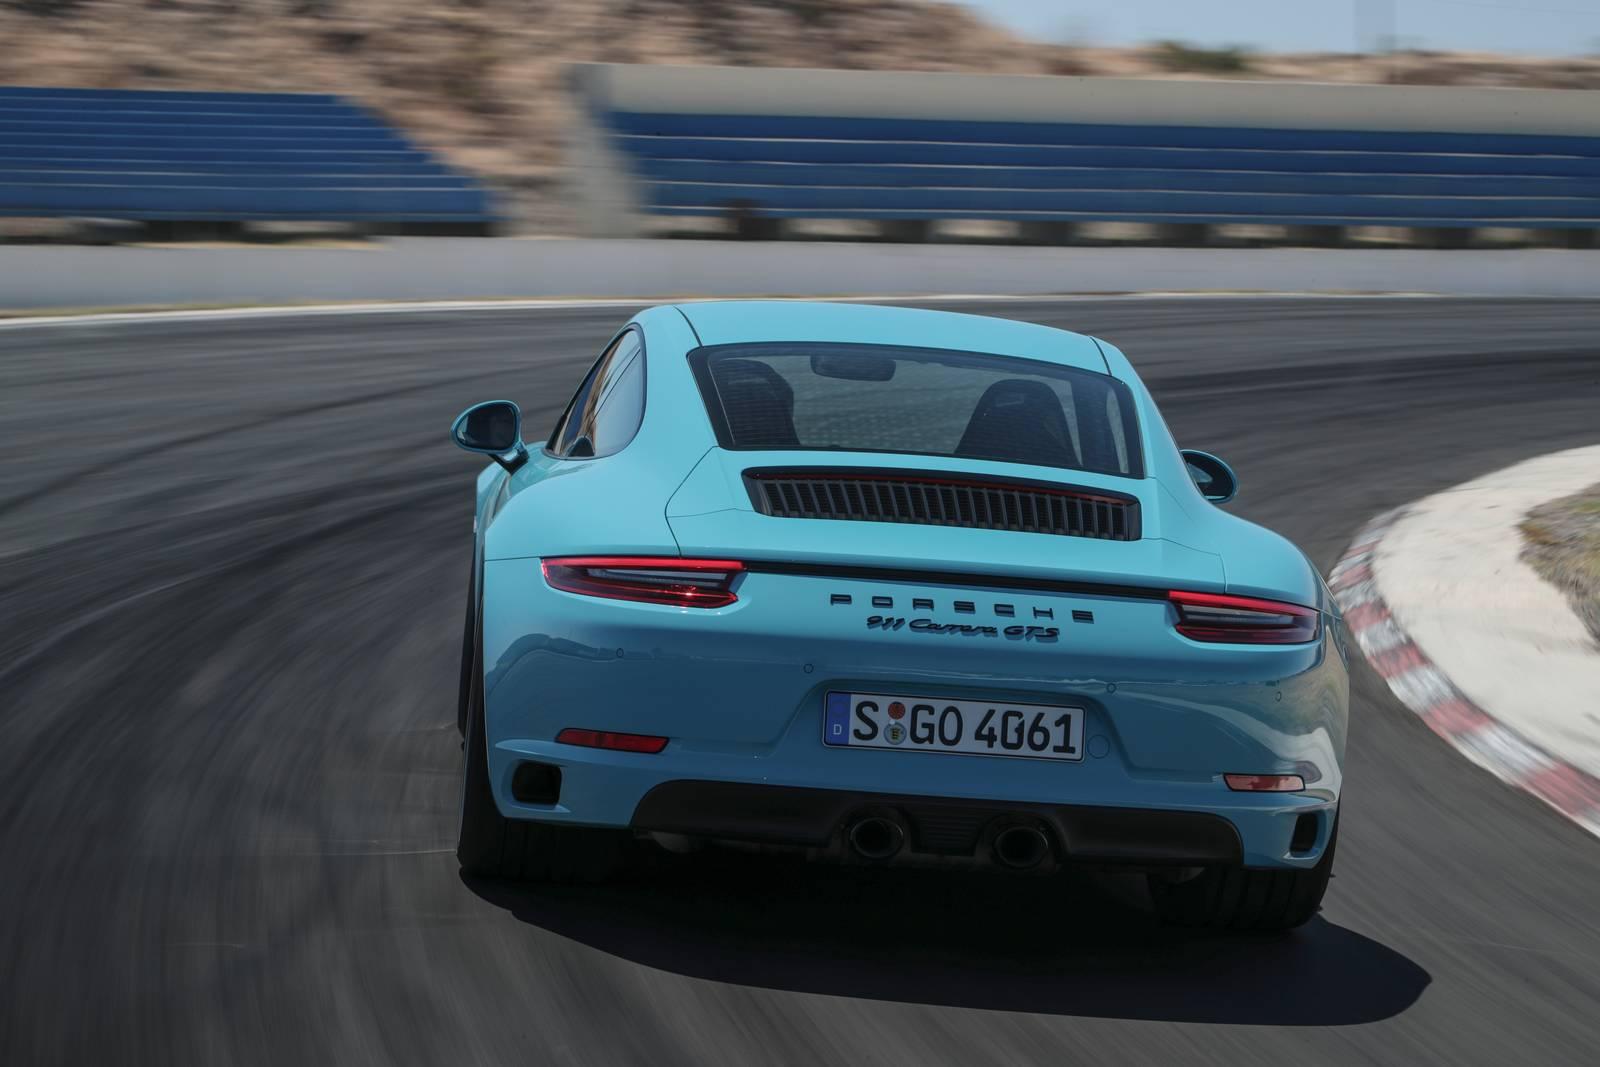 Porsche Mission E >> 2017 Porsche 911 GTS Faster than 991.1 GT3 at Nurburgring, 7m 24s - GTspirit